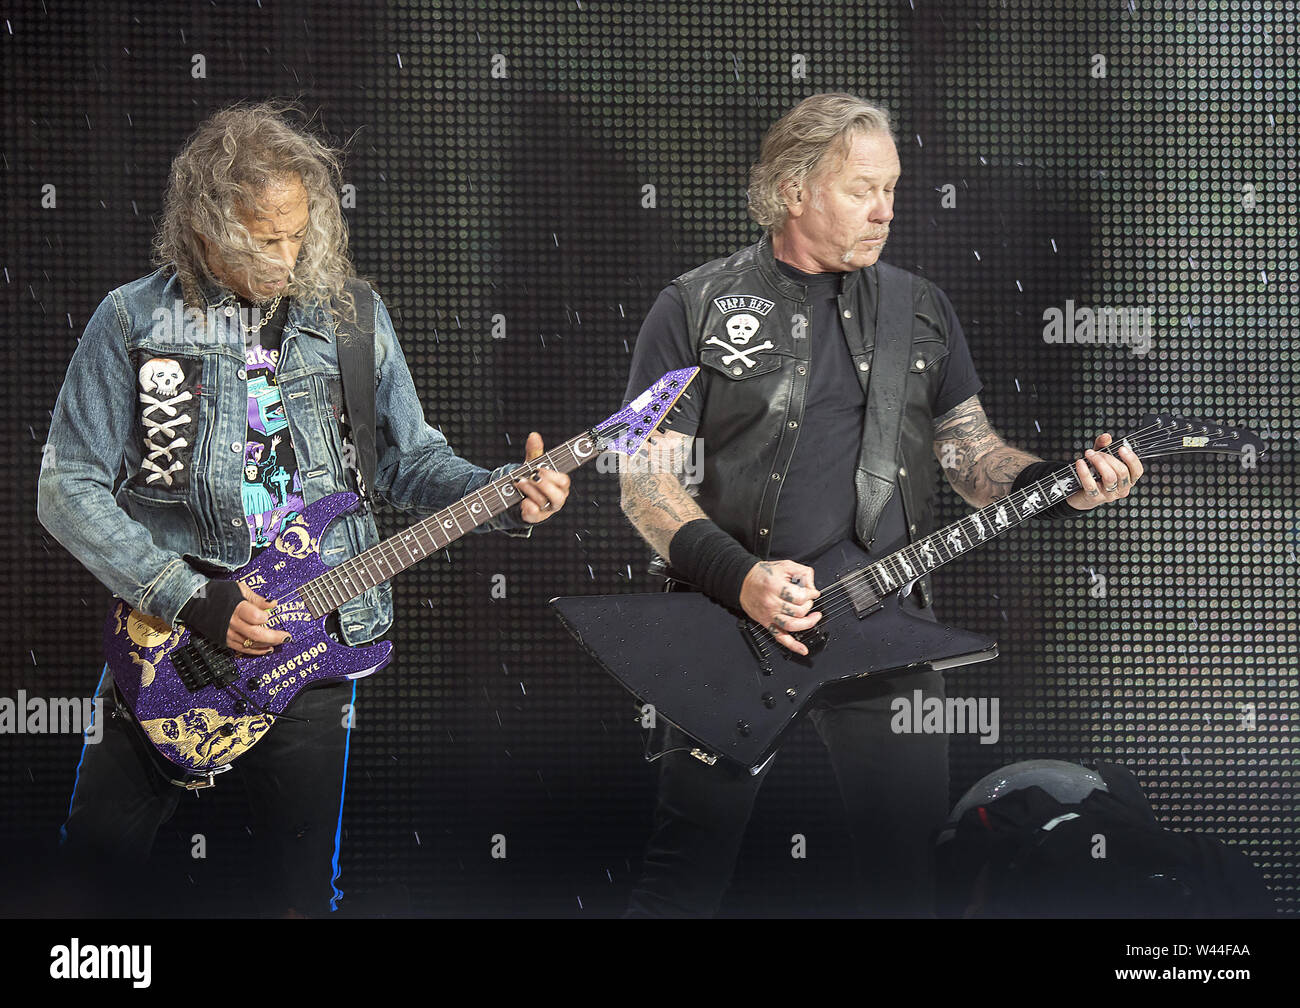 Metallica Performing On Their Worldwired Tour 2019 at Manchester Etihad Stadium Featuring: Metallica, James Hetfield, Kirk Hammett Where: Manchester, United Kingdom When: 18 Jun 2019 Credit: Sakura/WENN.com - Stock Image